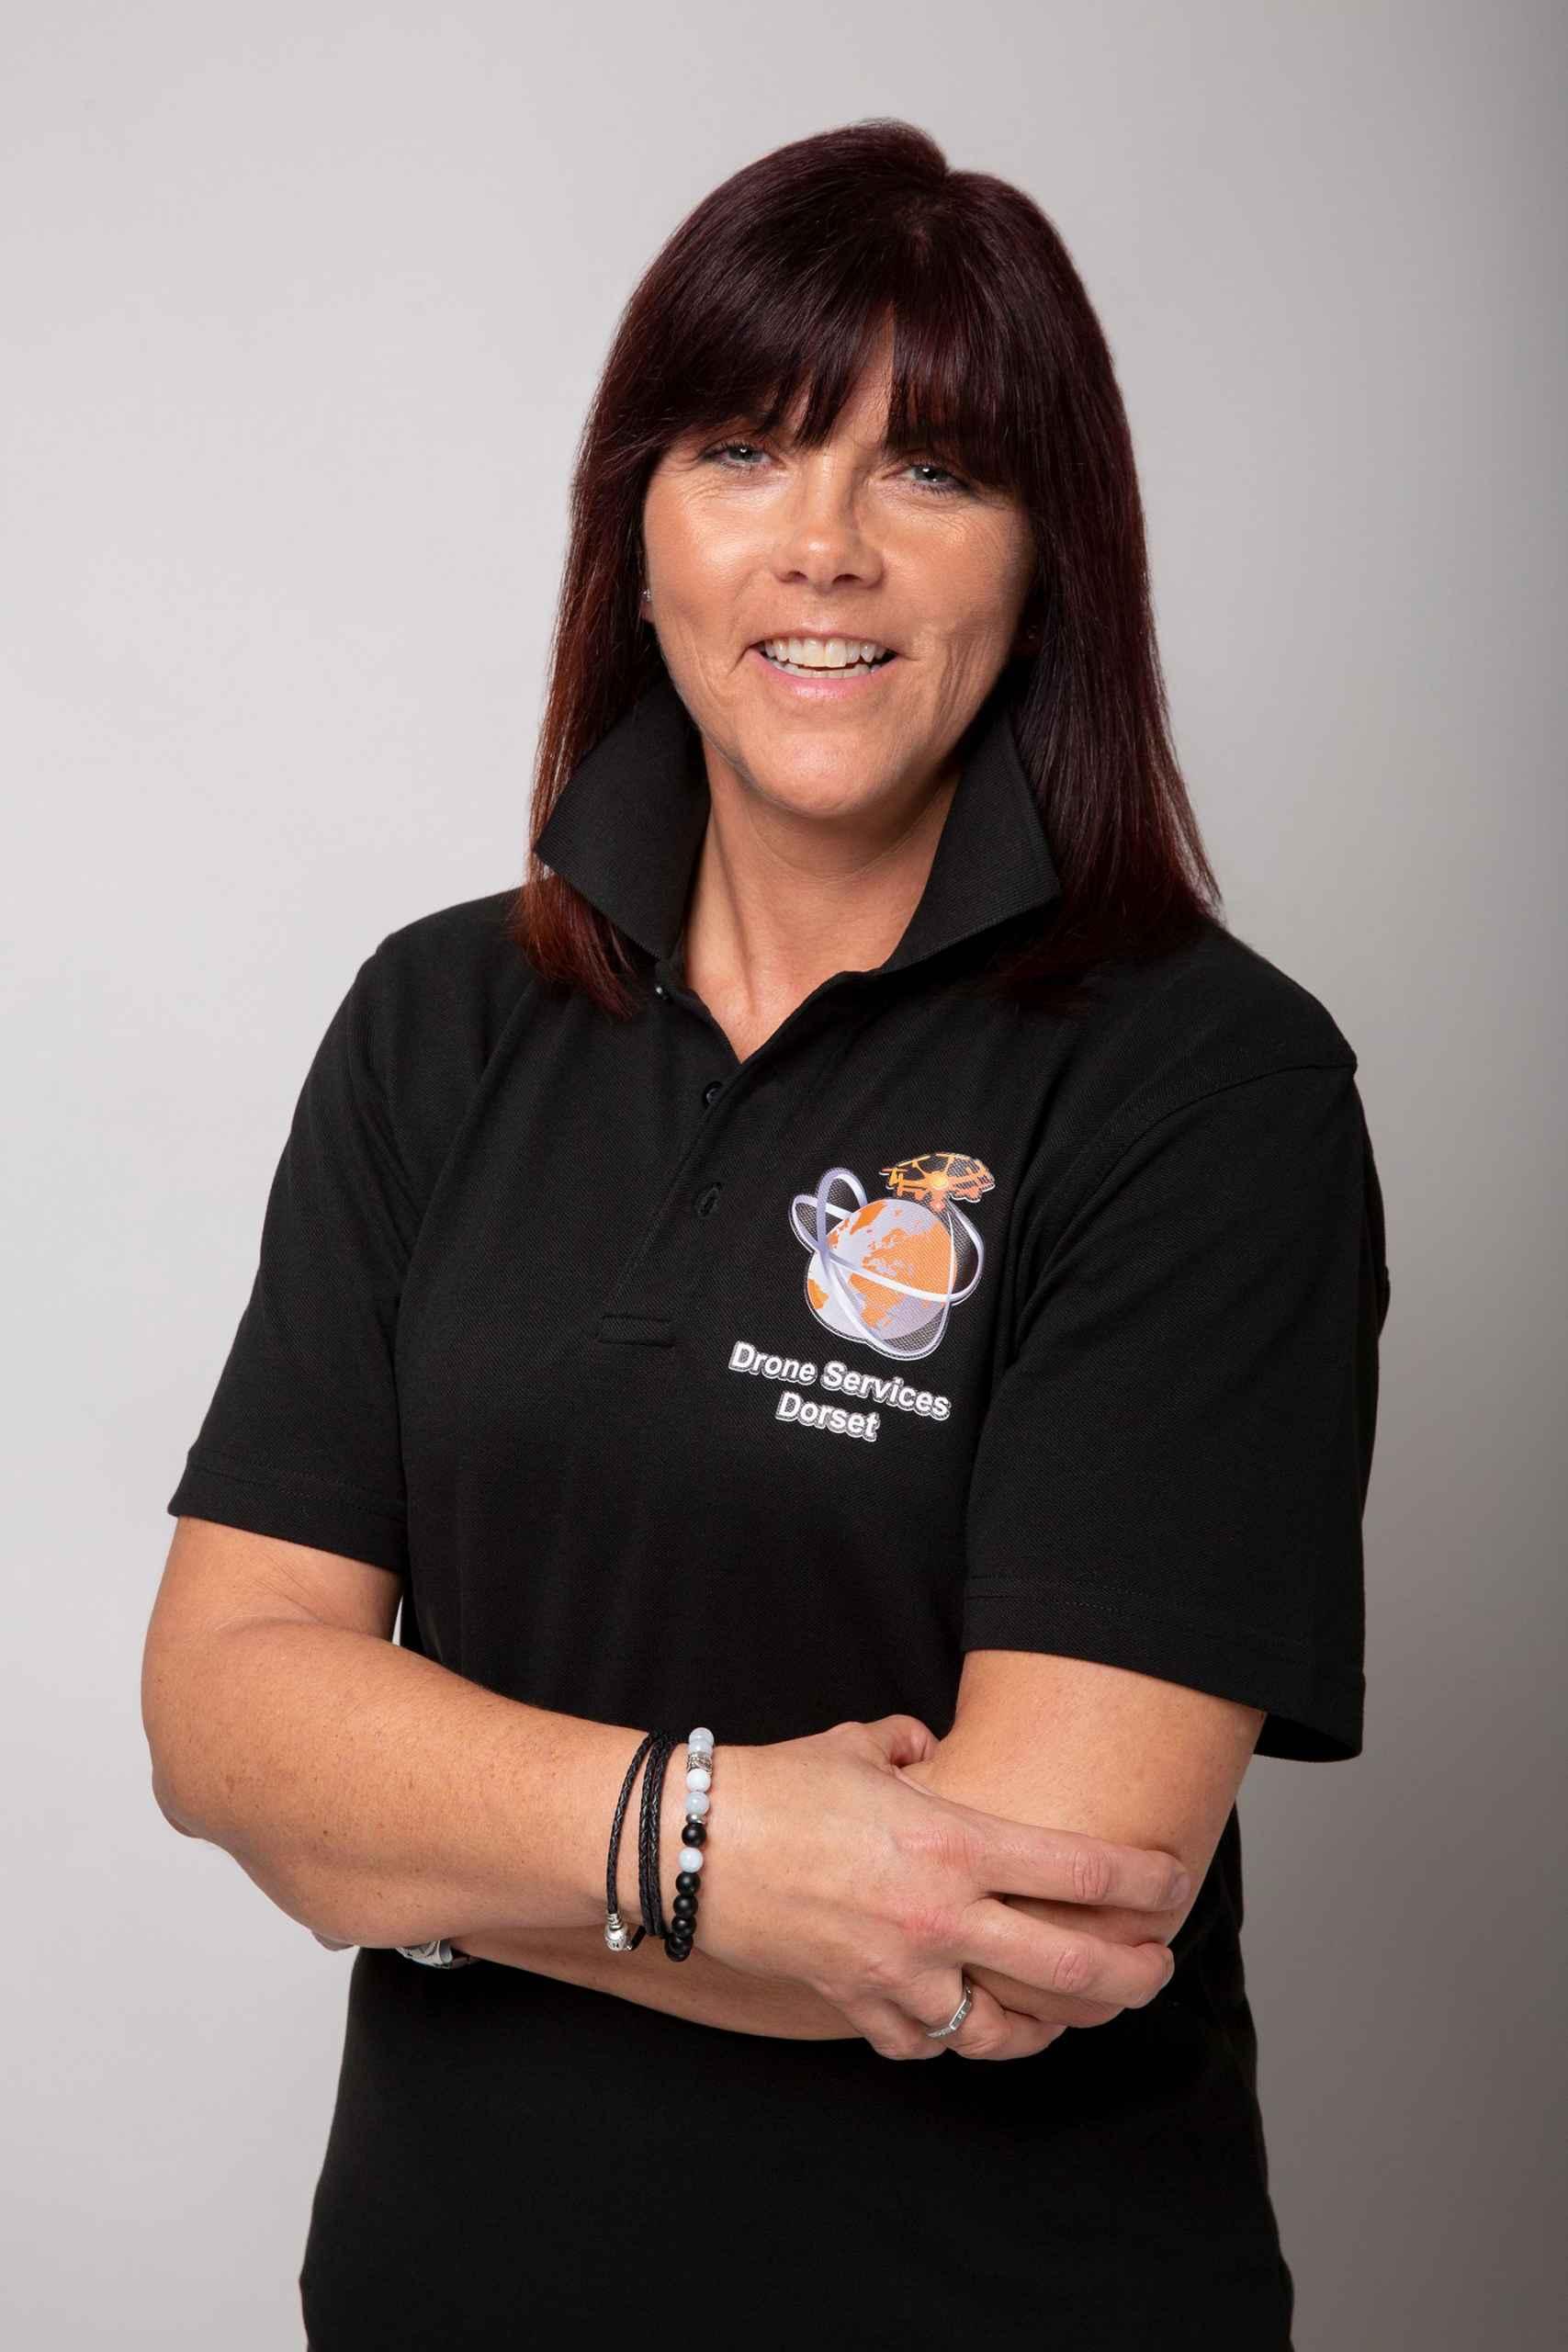 Claire DuPavey - Meet the team at Drone Services Dorset